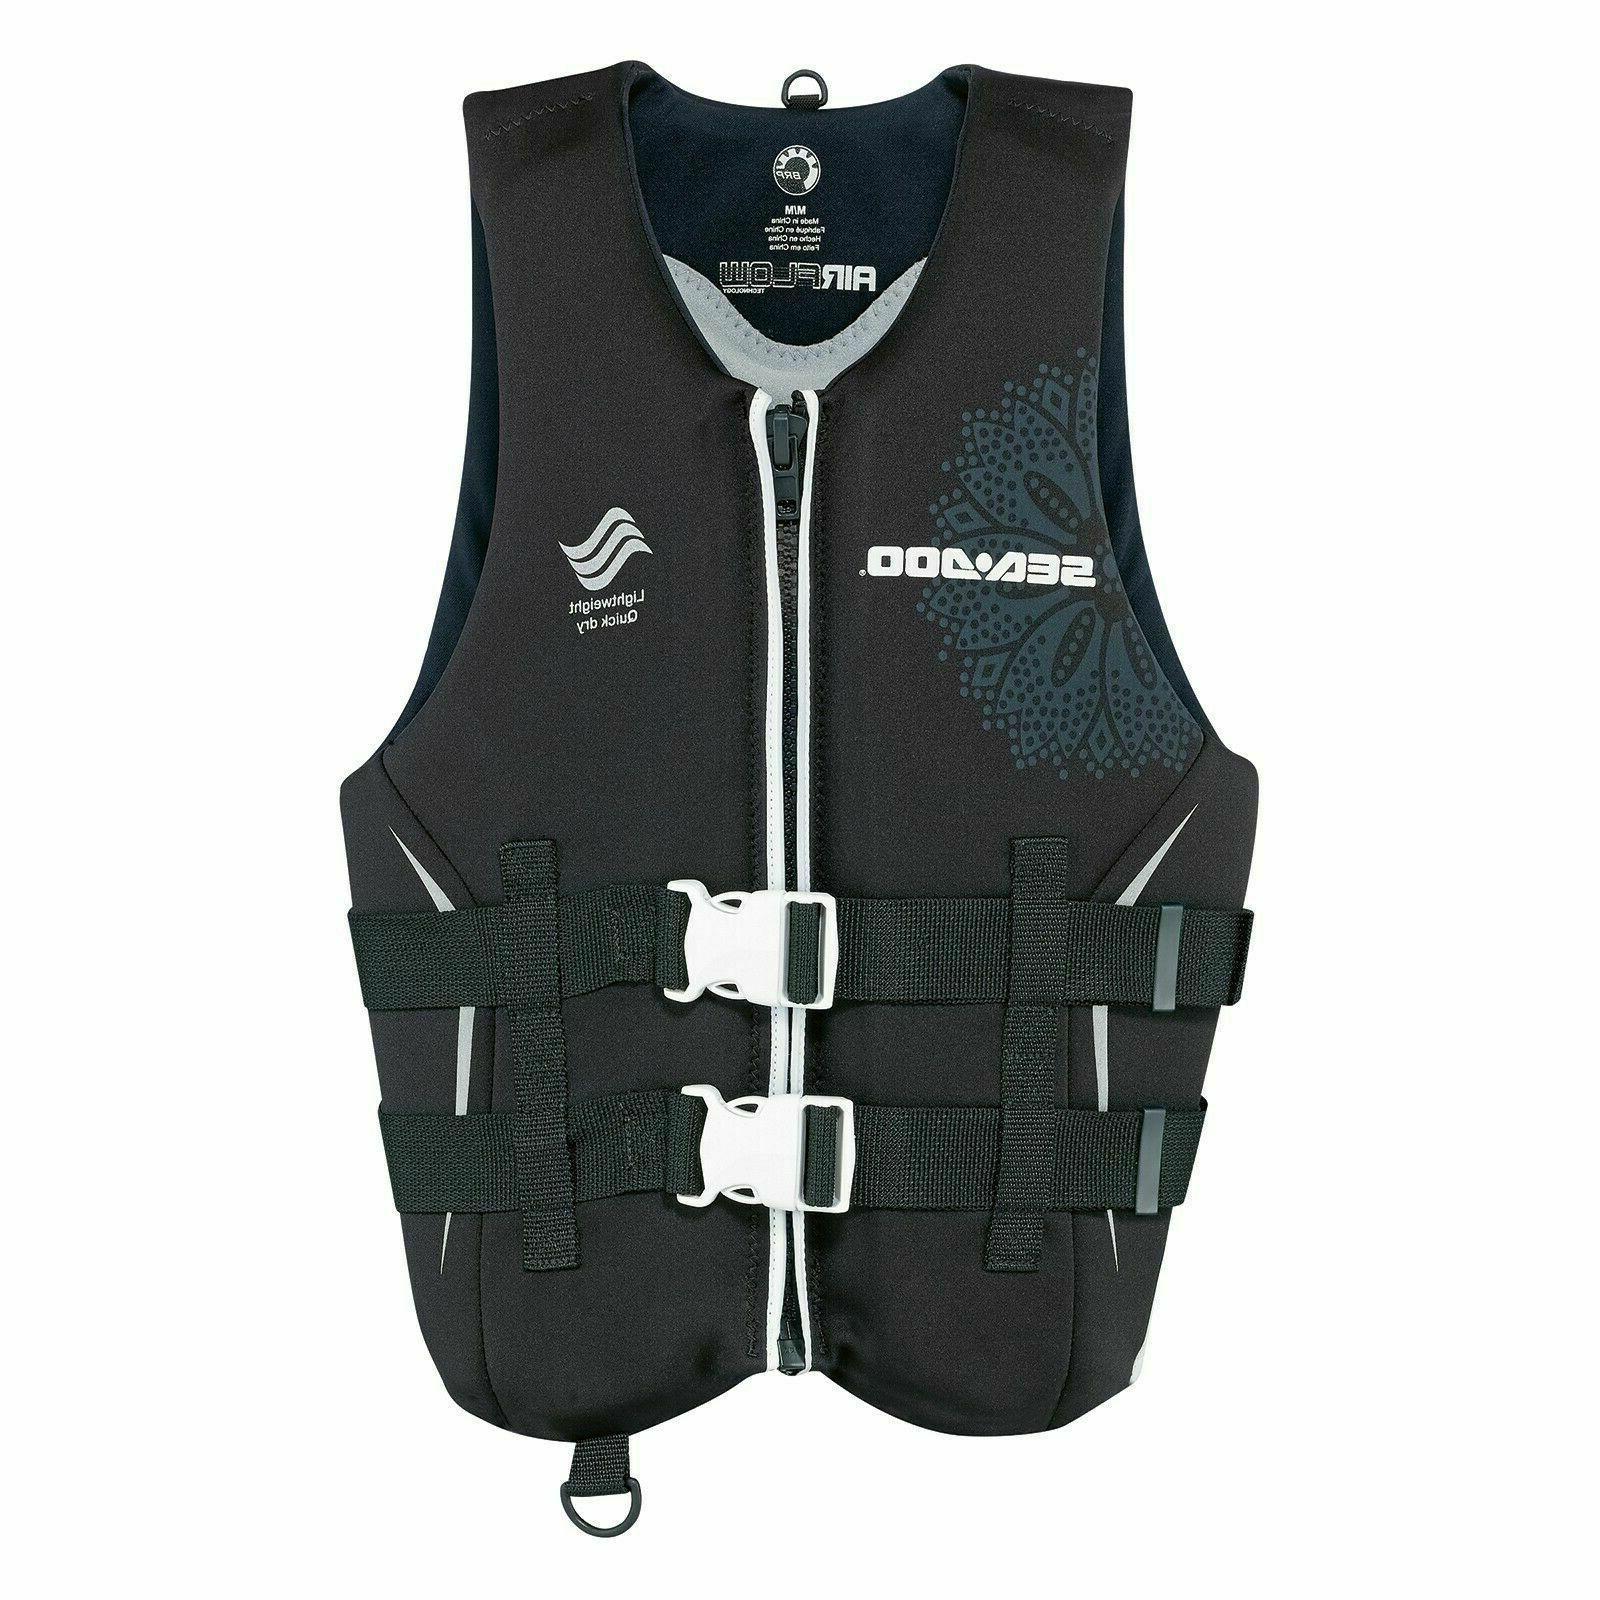 sea doo ladies airflow life jacket 285873